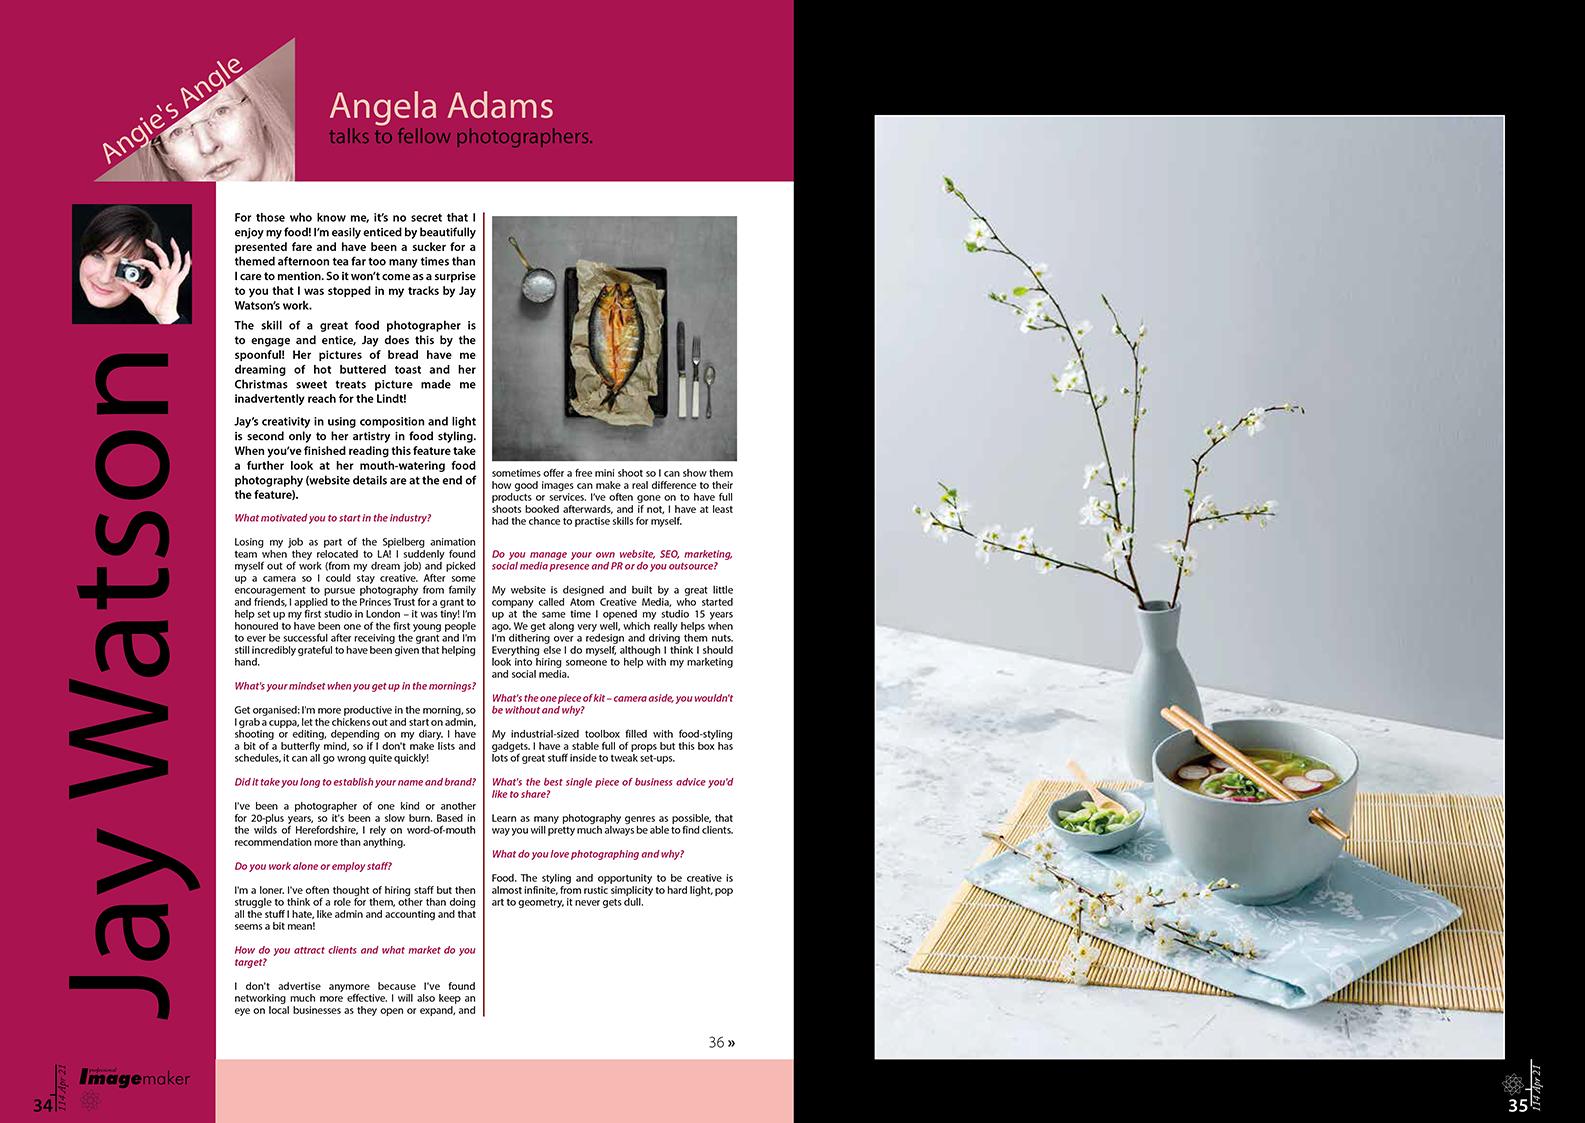 norfolk writer and photographer - tear sheets and copy - angela adams - jay watson food photography